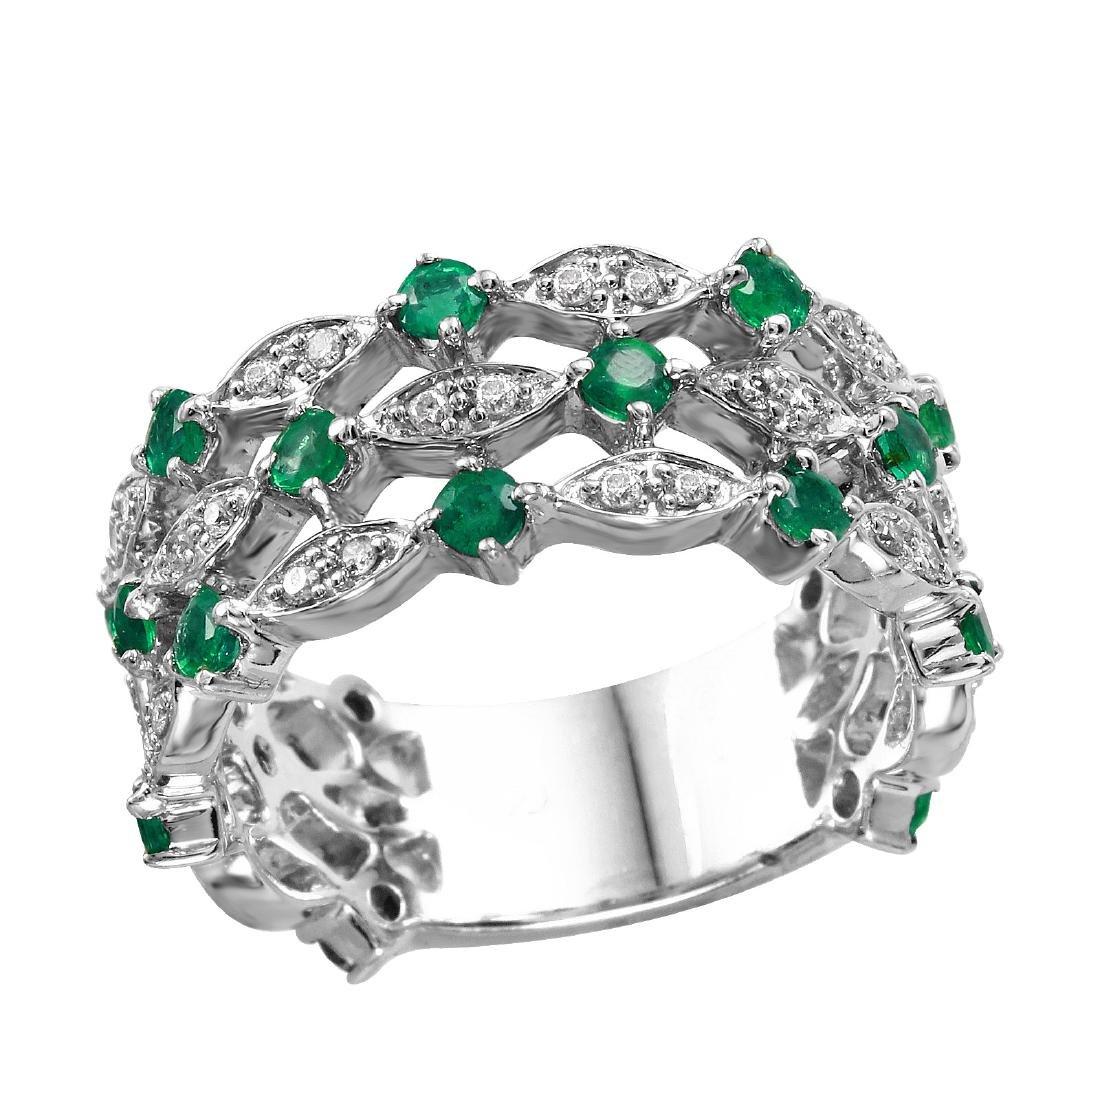 14KT White Gold 1.25ctw Emerald Diamond Ring Size 6.25